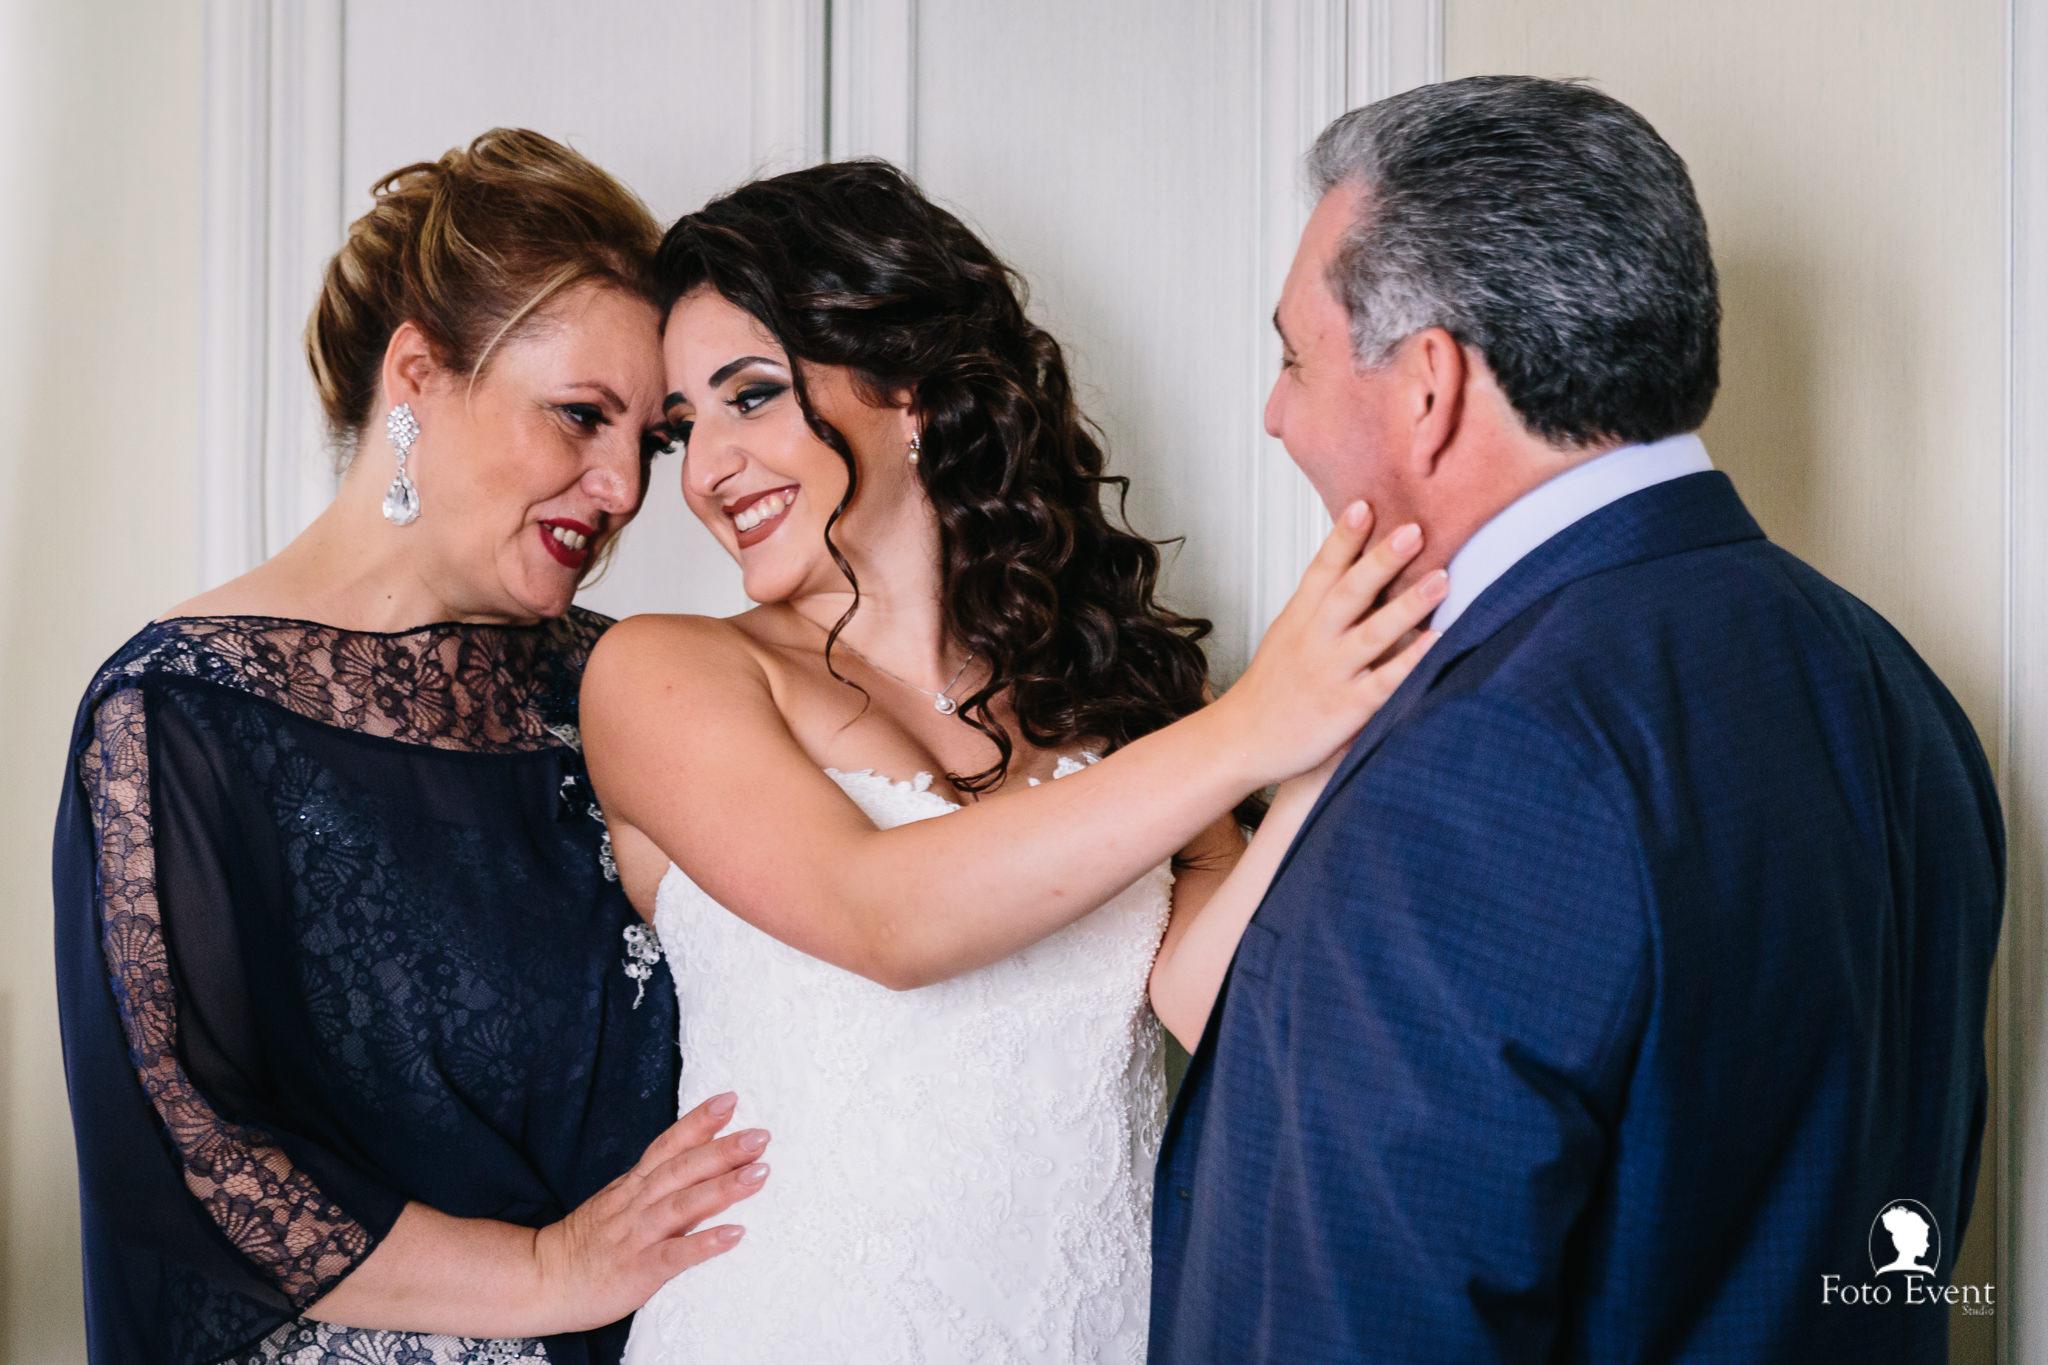 019-2019-08-31-Matrimonio-Serena-e-Saverio-Tarantino-5DE-557